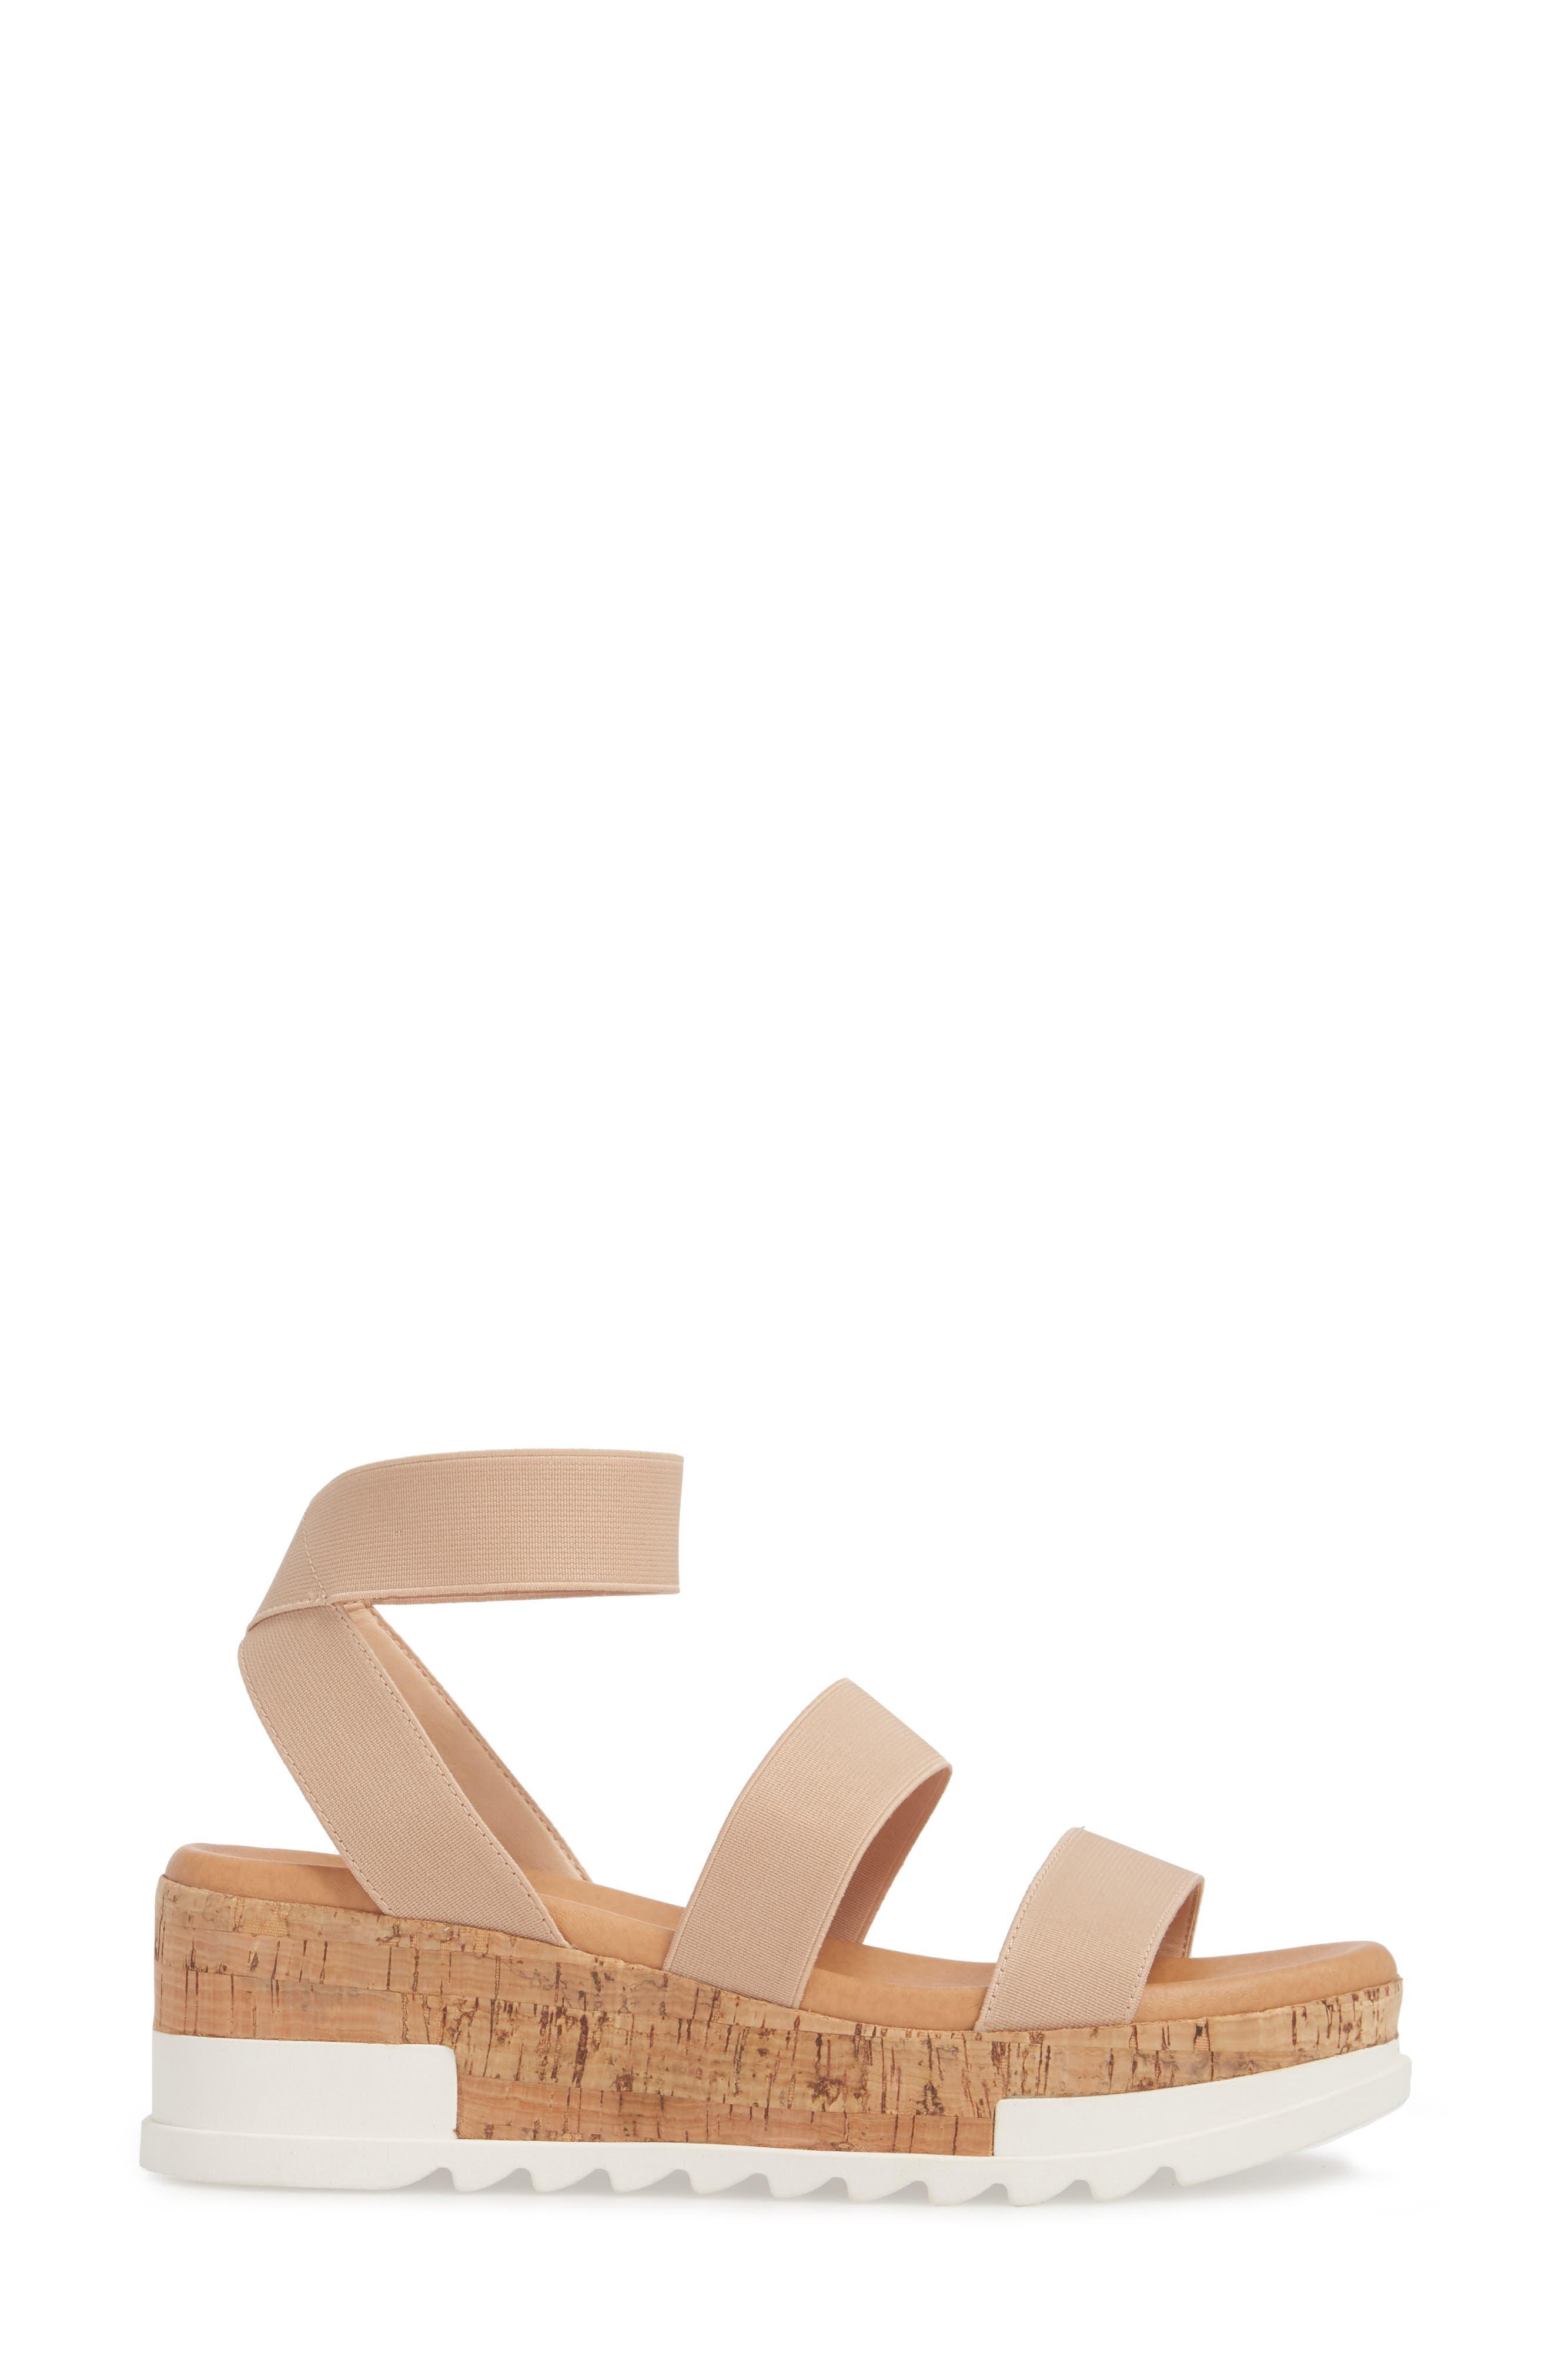 Bandi Platform Wedge Sandal,                             Alternate thumbnail 3, color,                             Blush